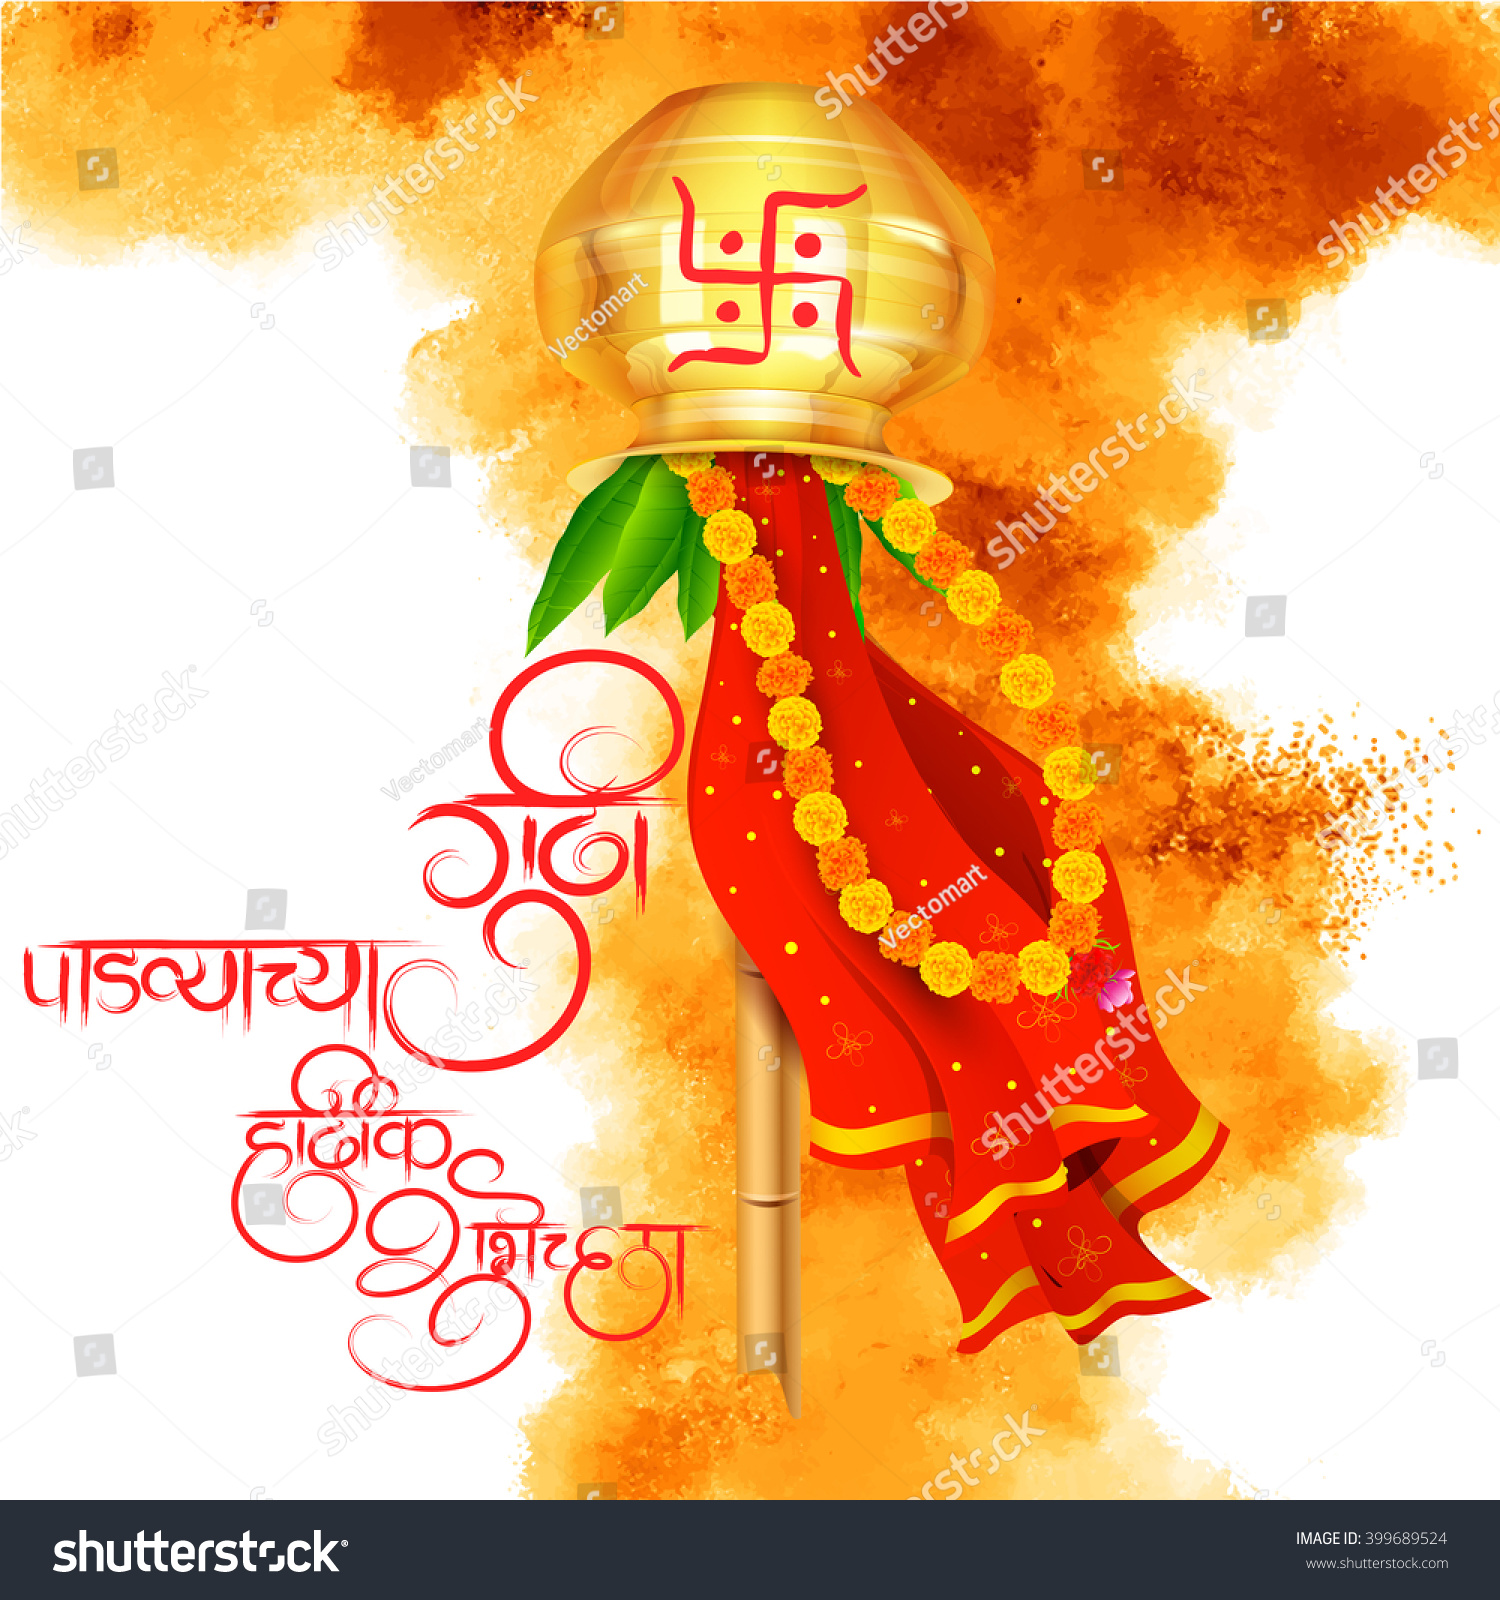 Illustration Gudi Padwa Lunar New Year Stock Vector Royalty Free